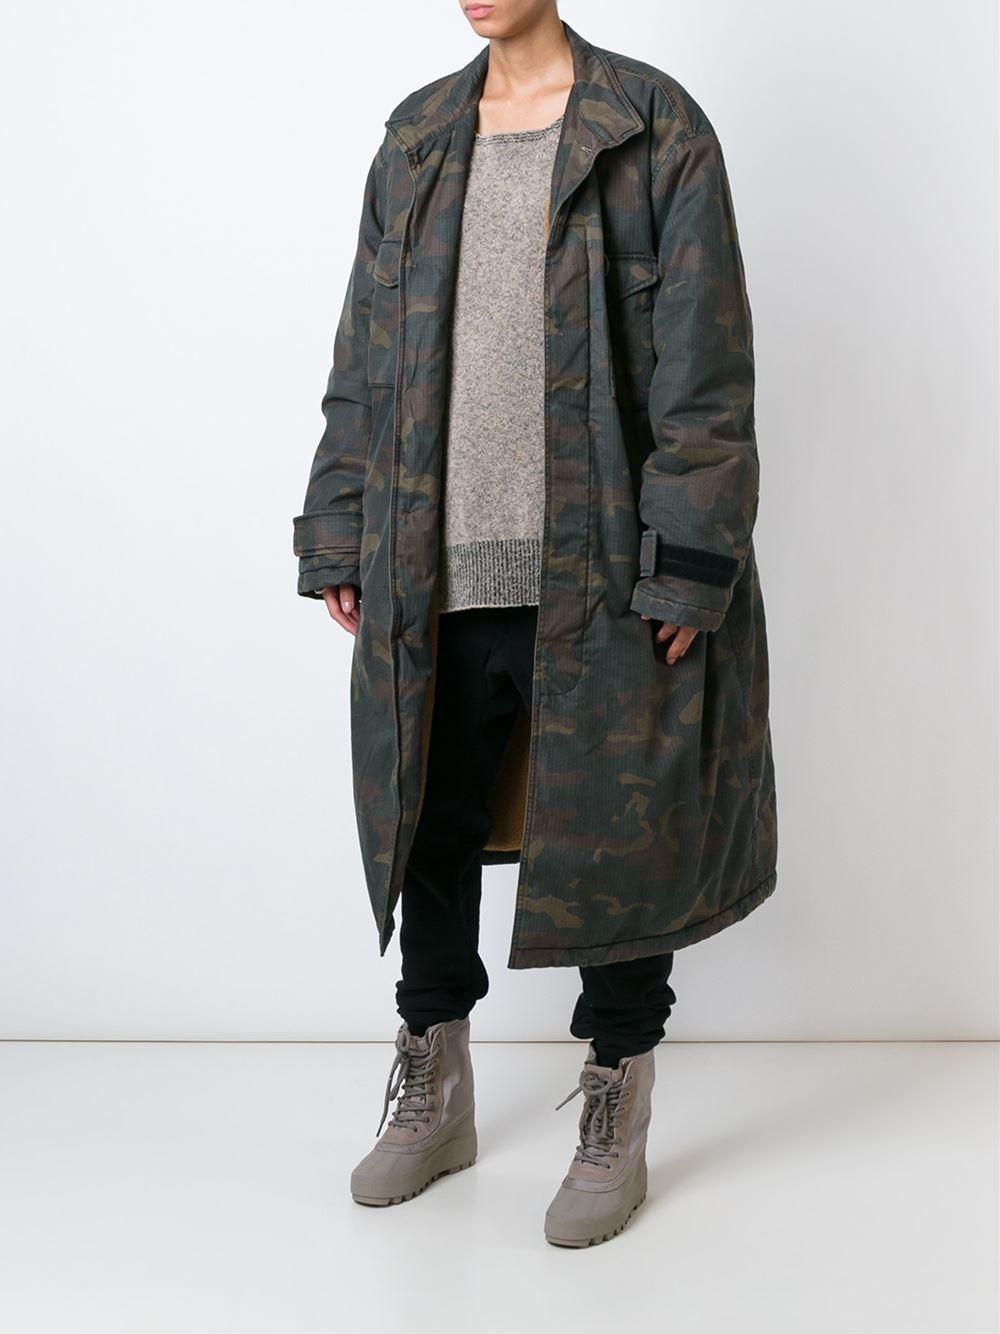 wholesale dealer a8d5a 88839 Yeezy Adidas Originals By Kanye West Camo Parka - Spazio Pritelli -  Farfetch.com